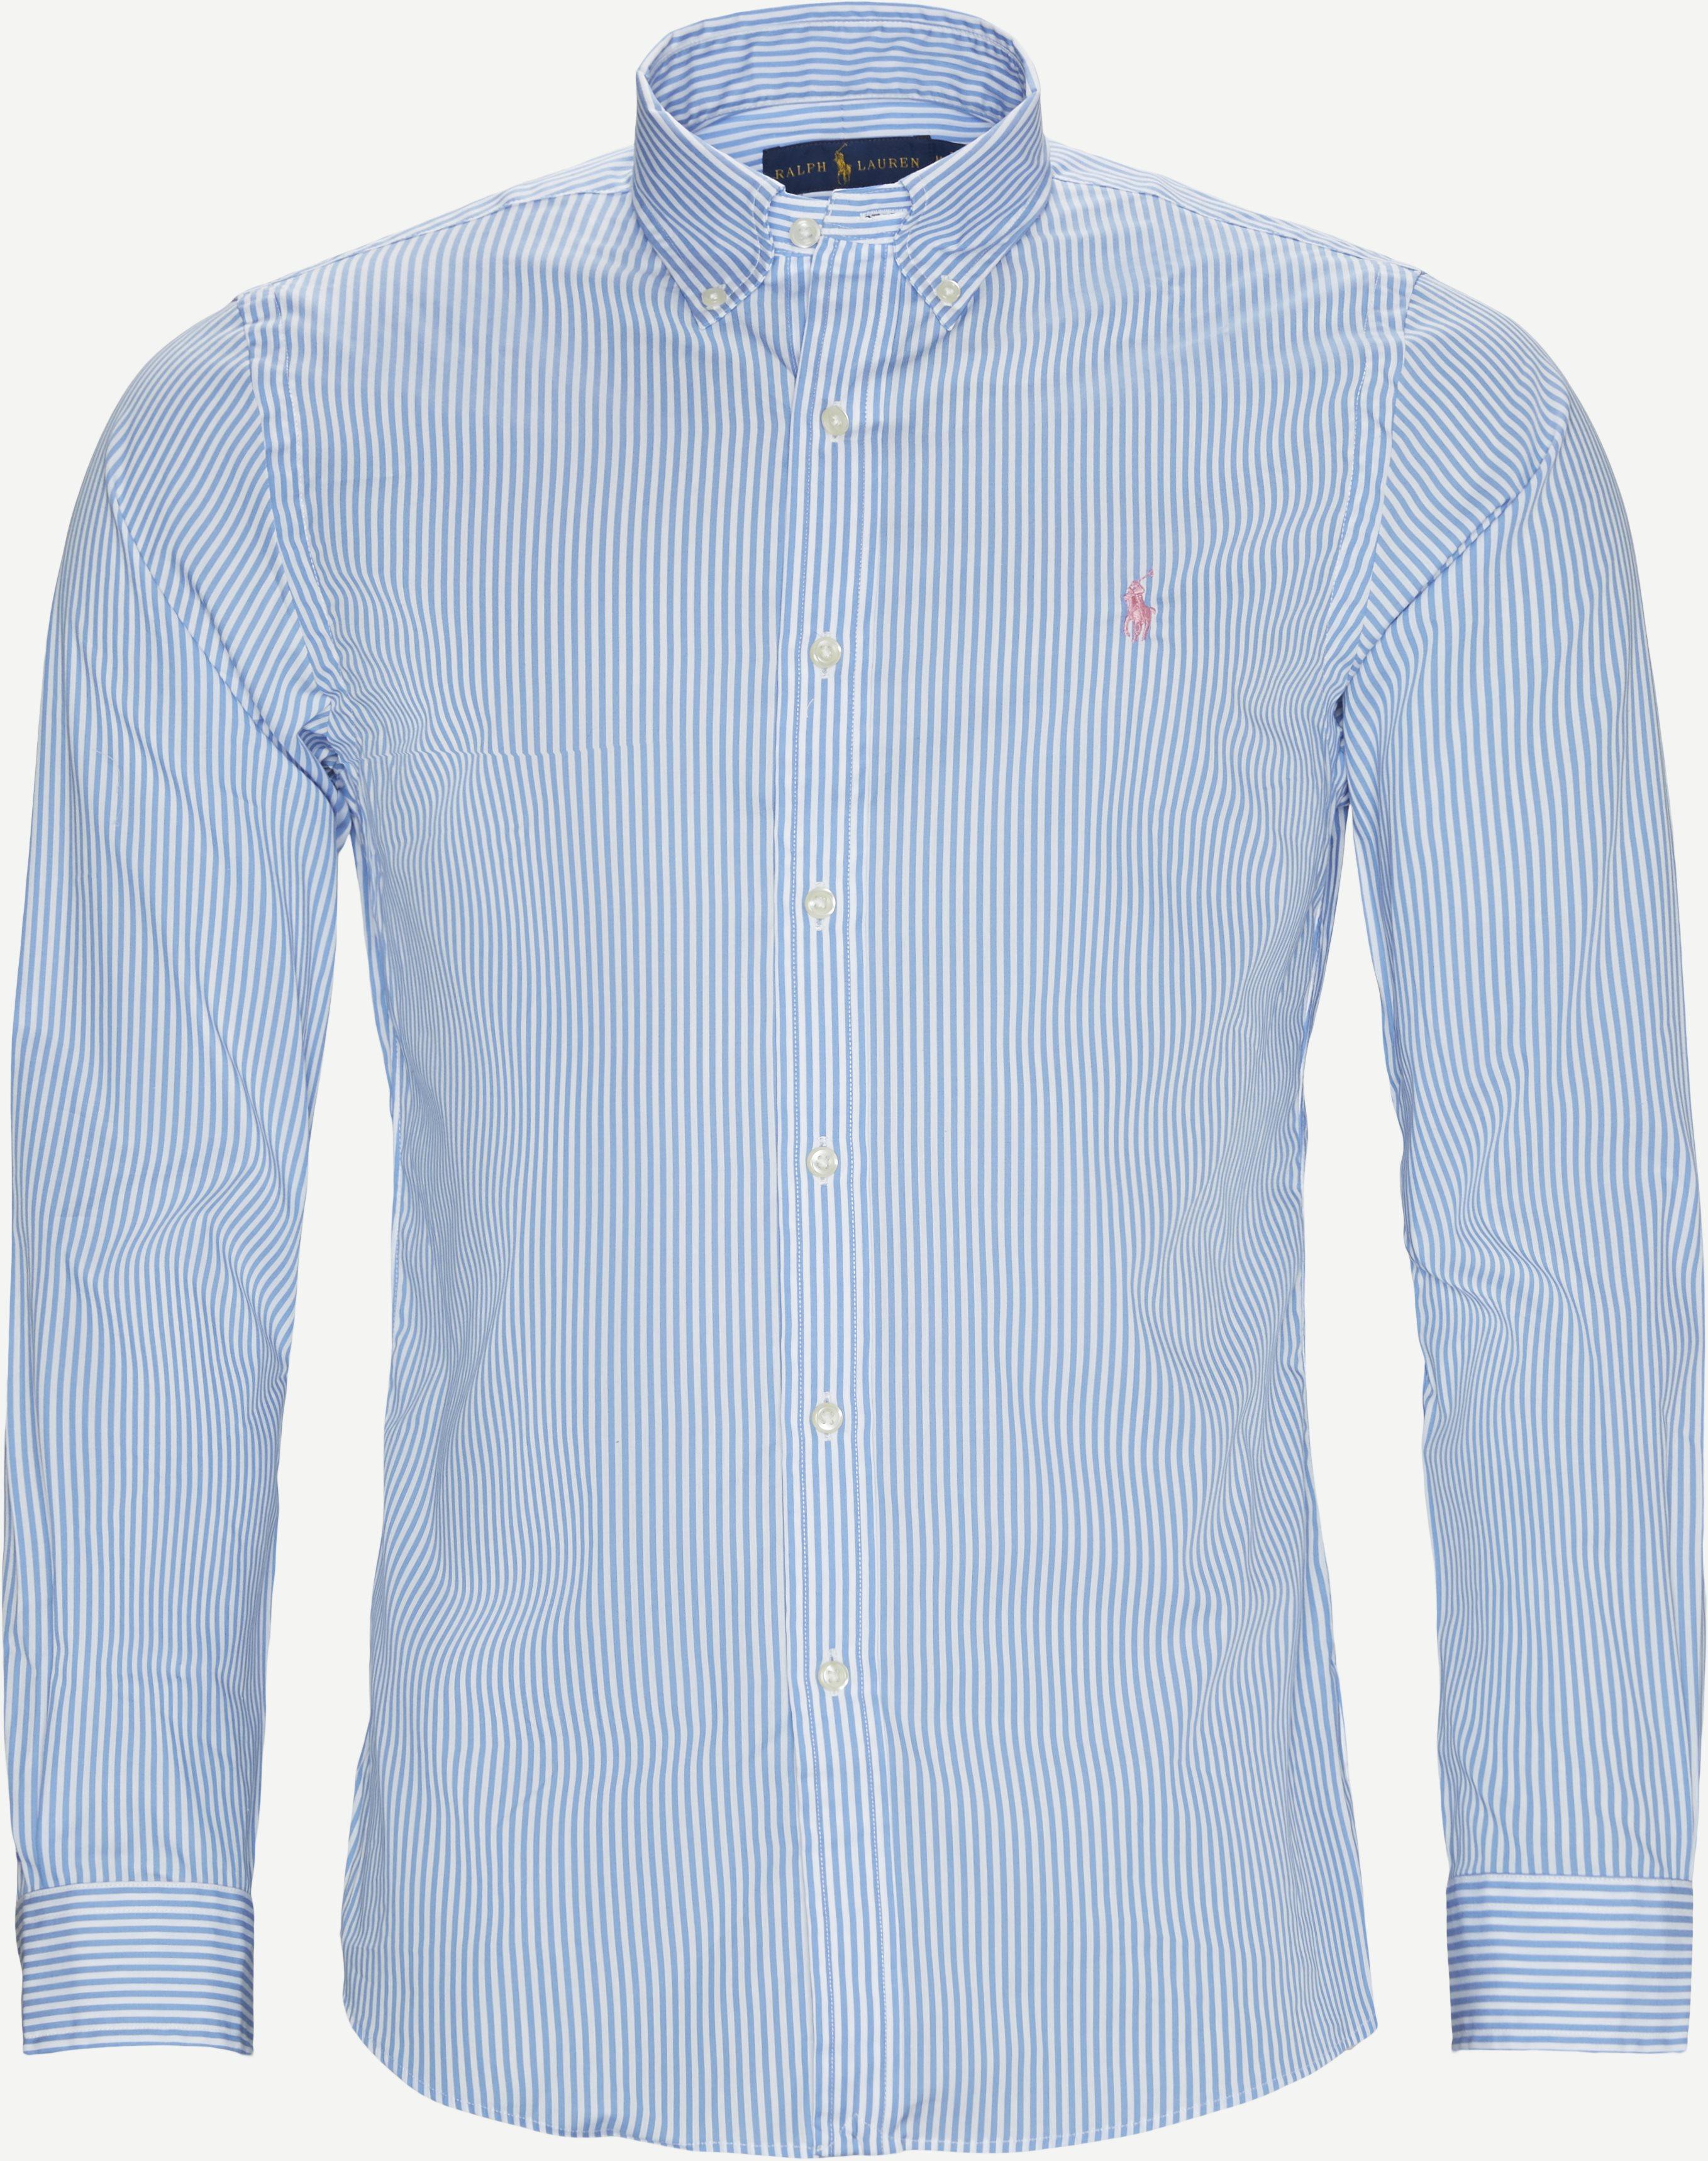 Skjortor - Slim fit - Blå